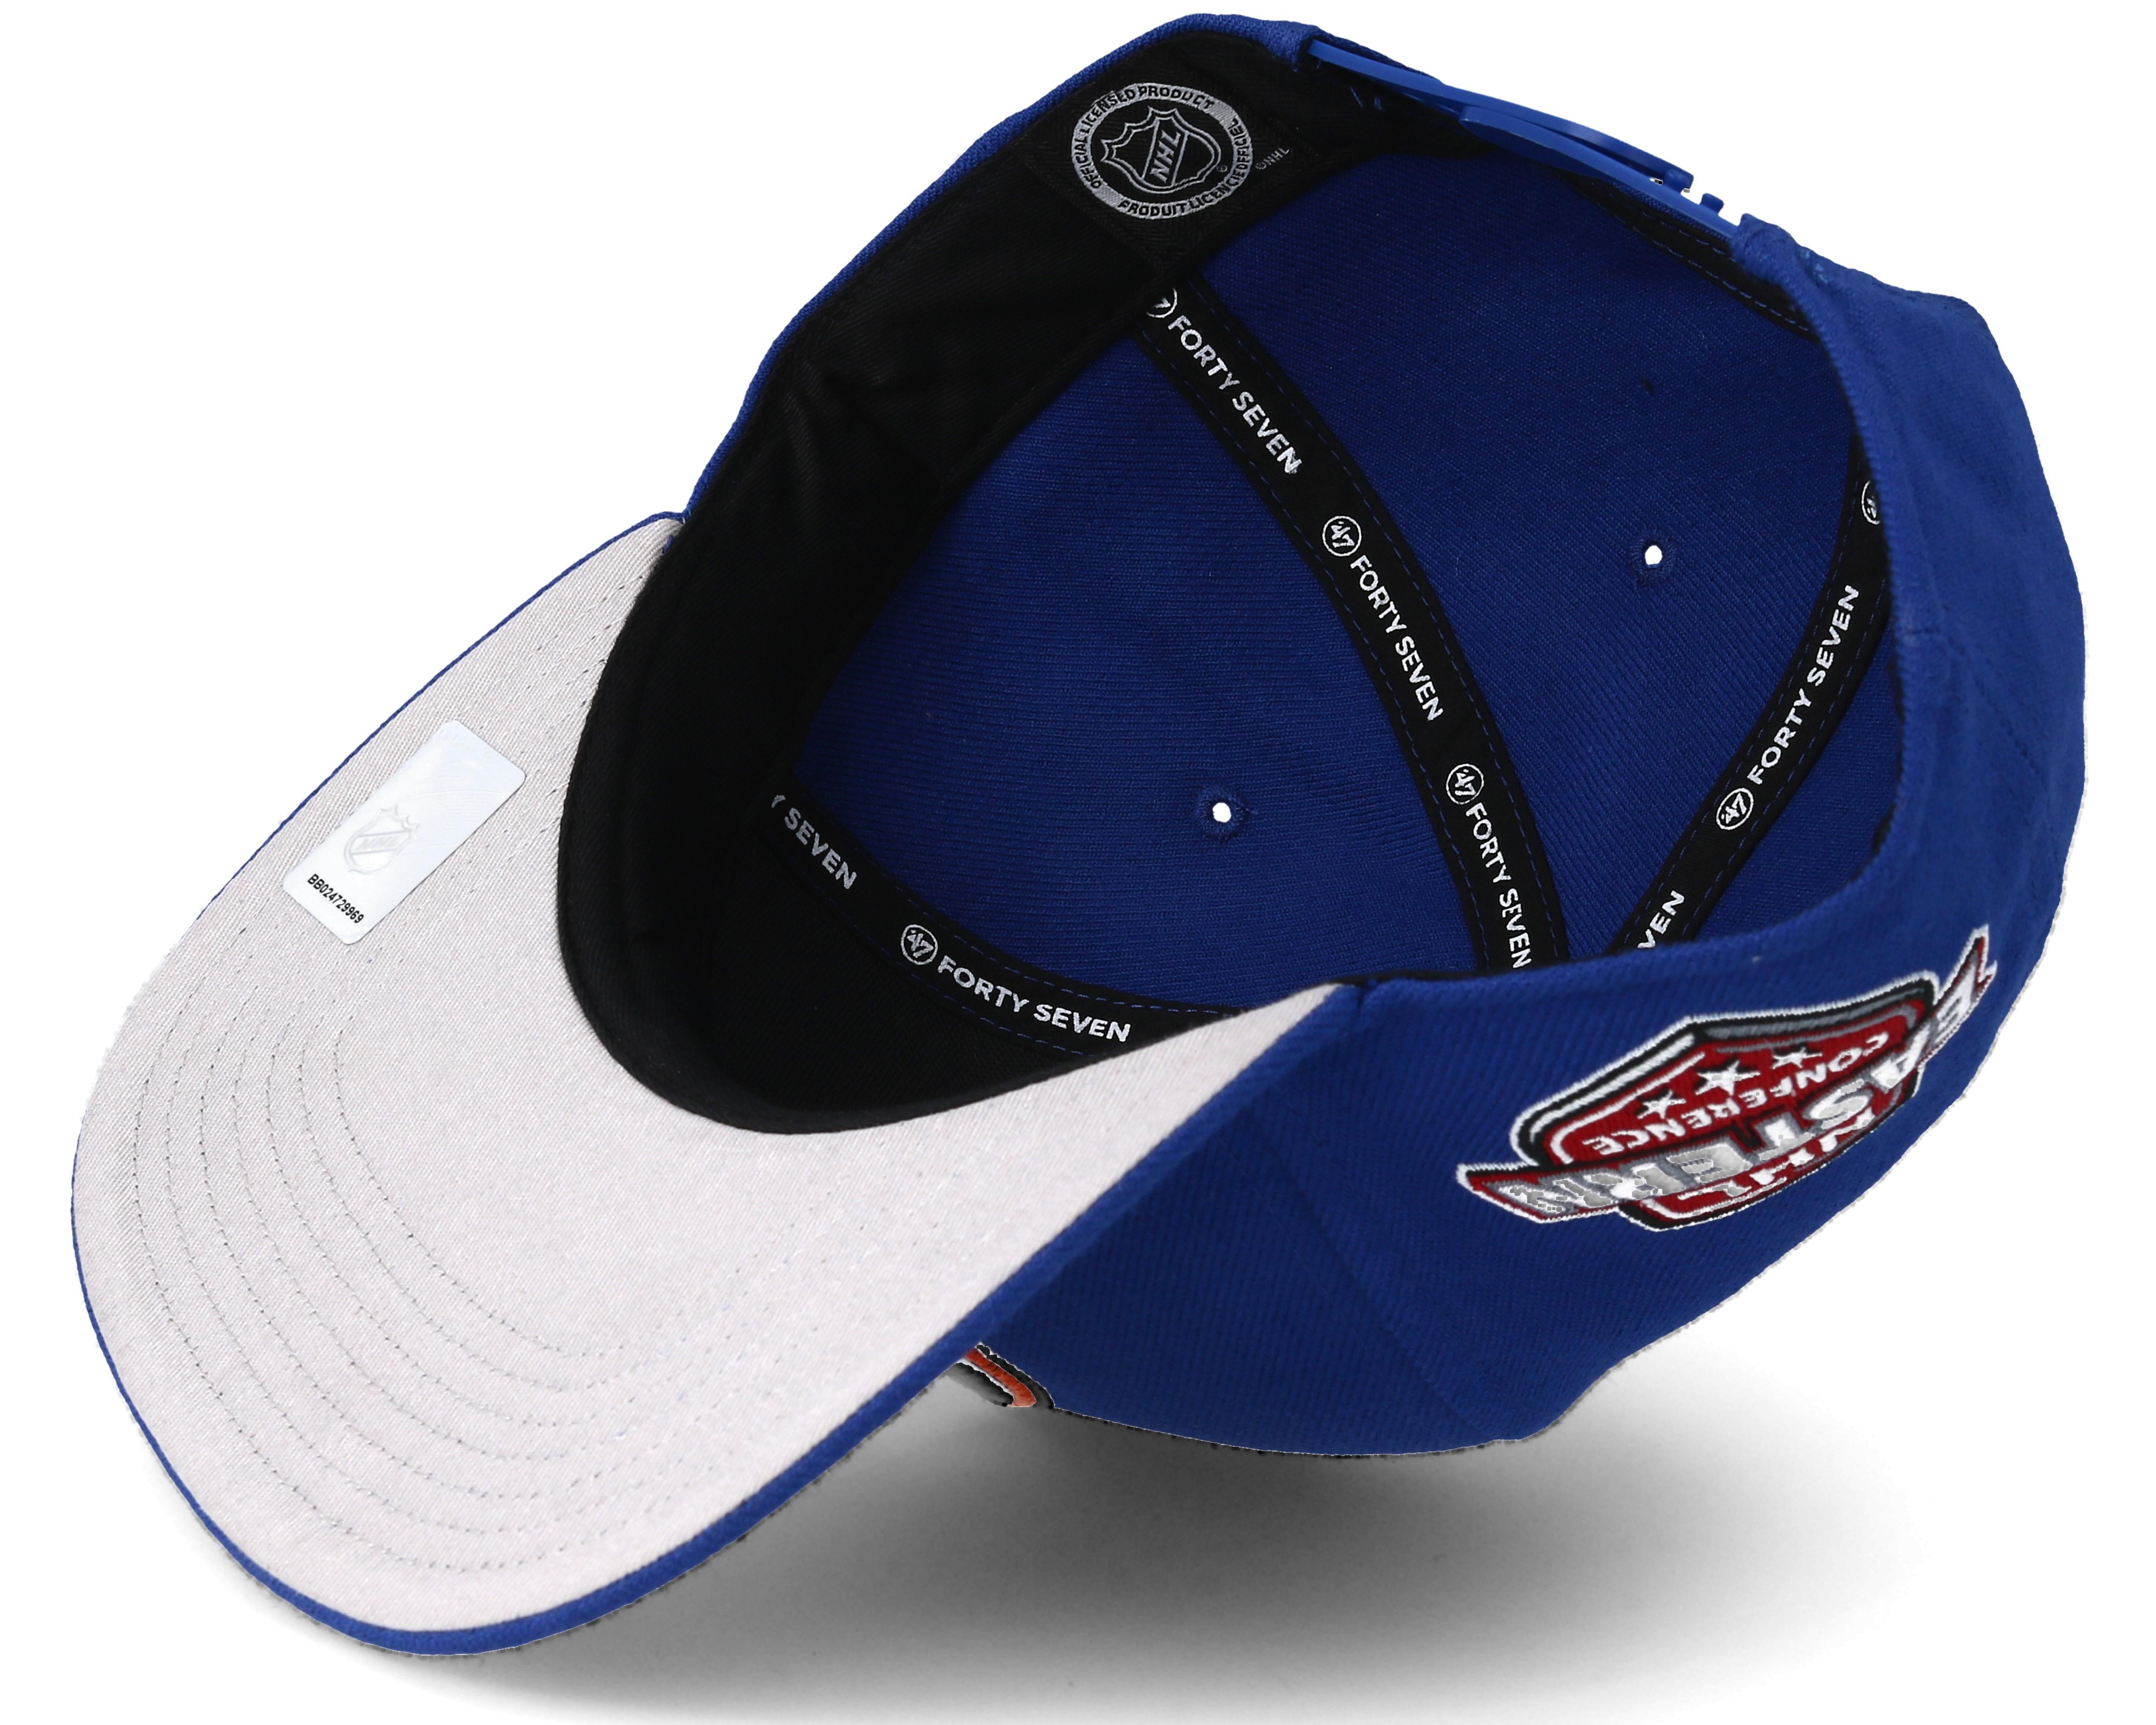 super popular a8daa b2c2c New York Islanders Sure Shot Royal Snapback - 47 Brand caps ...